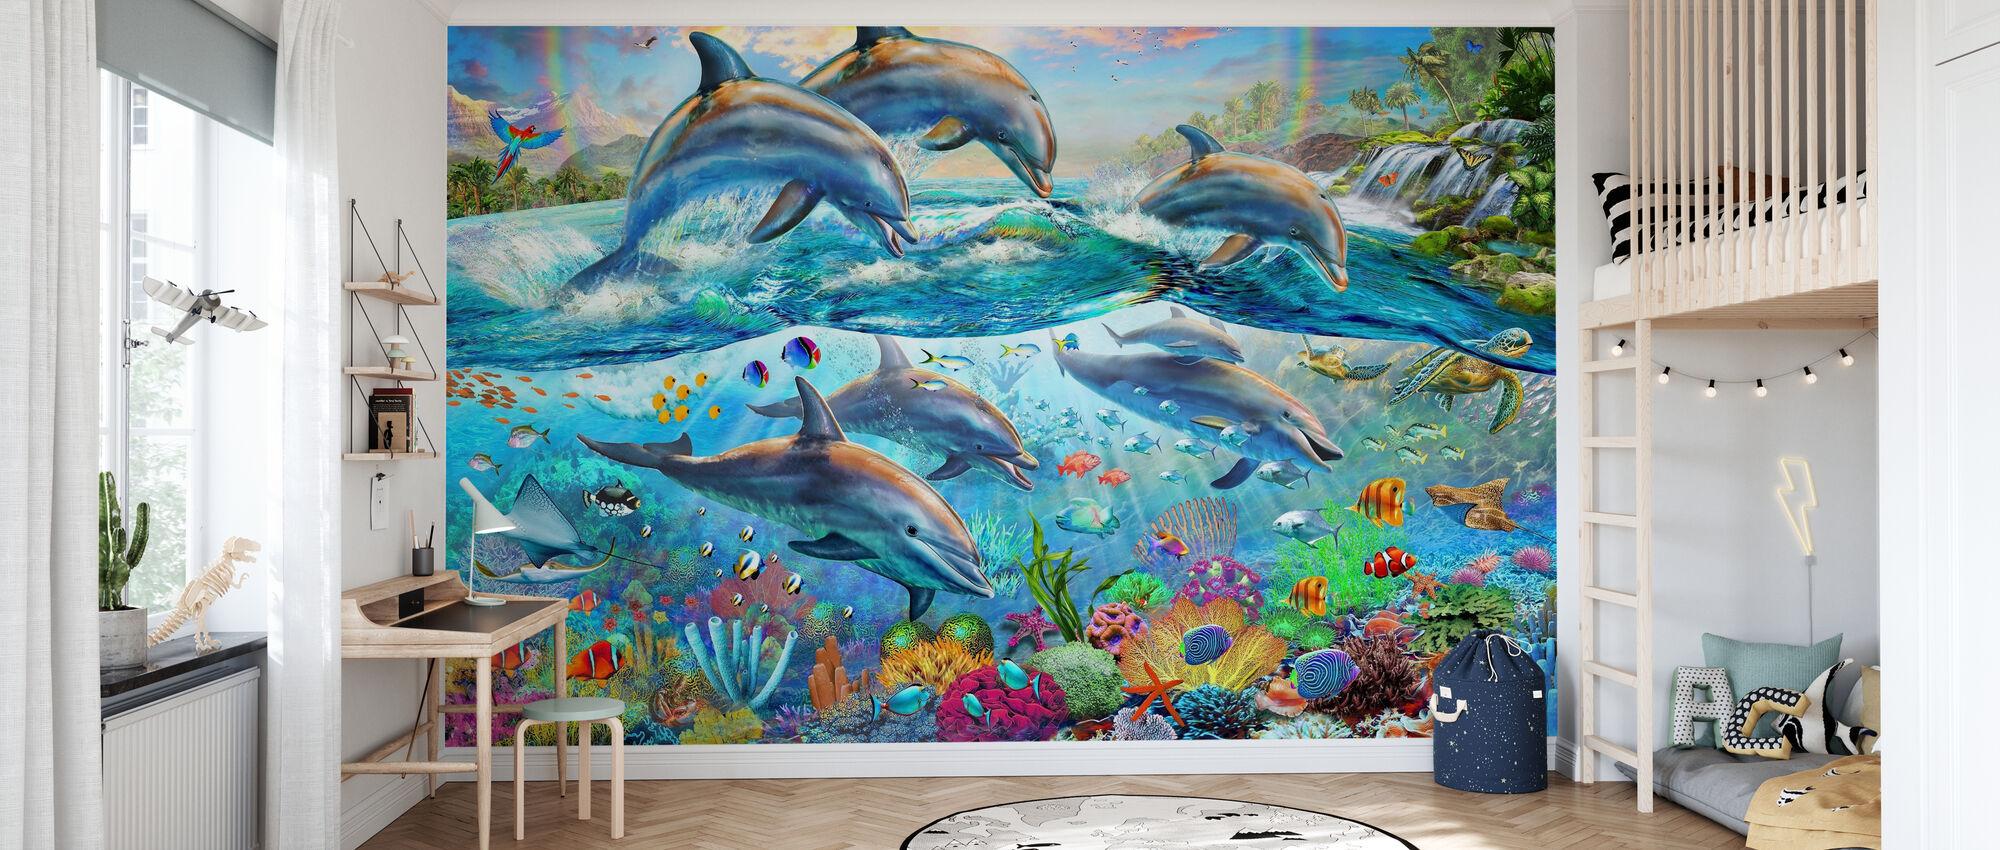 Tropical Seaworld - Wallpaper - Kids Room